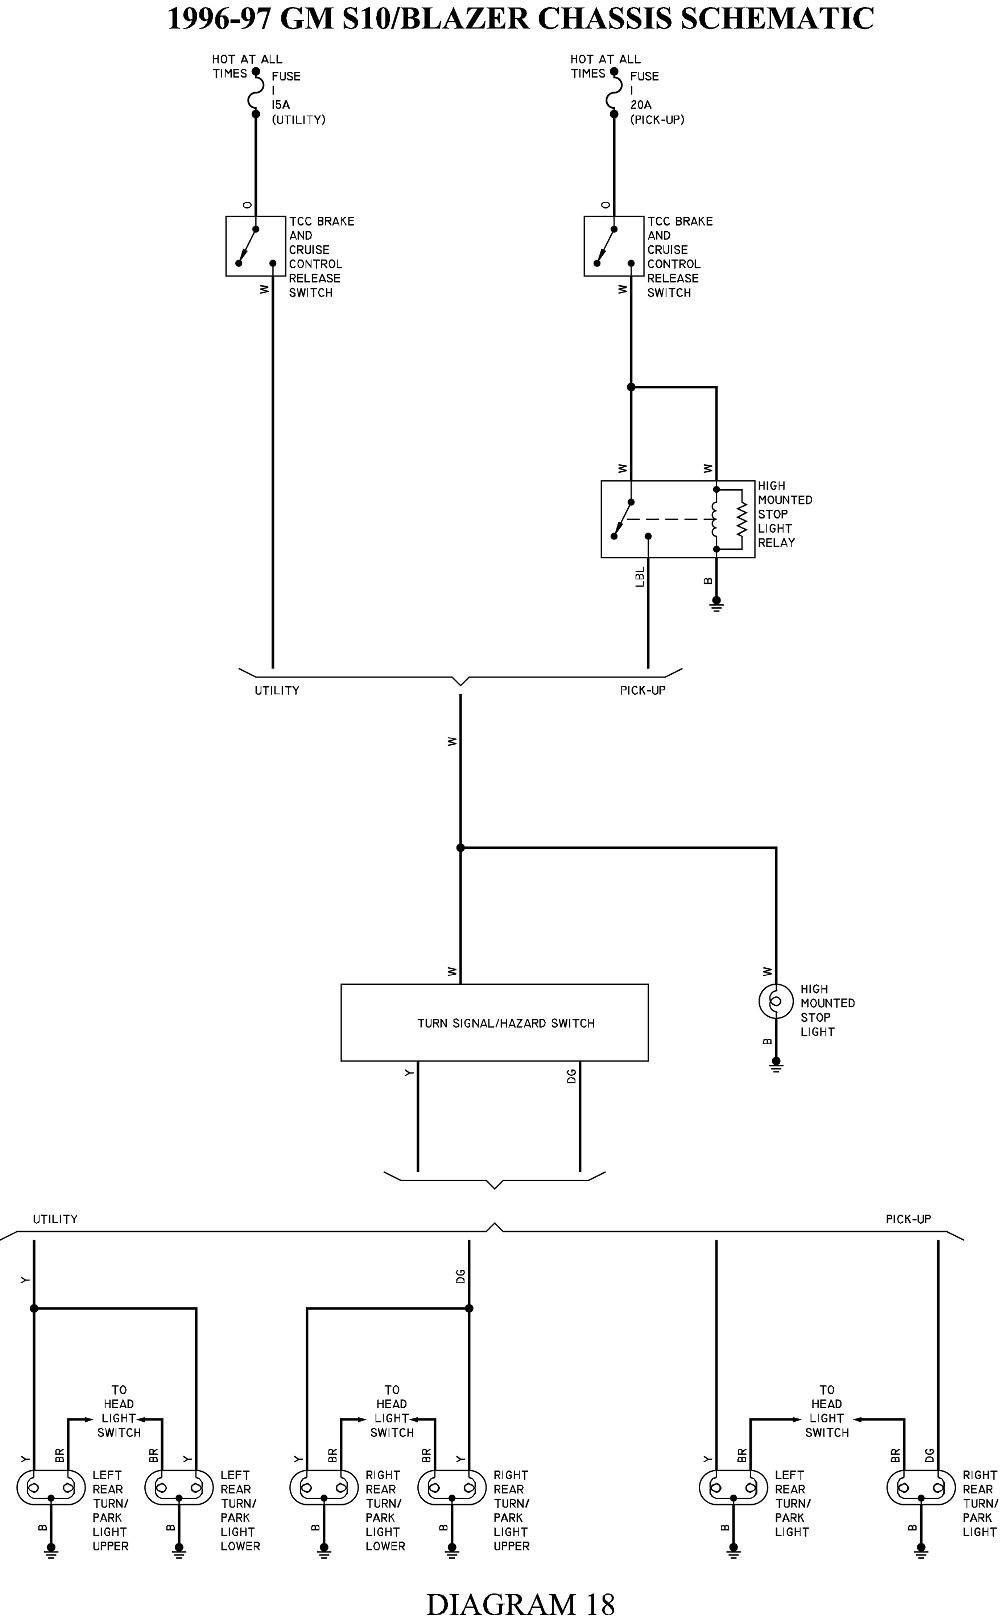 s10 frame diagram 97 chevy s10 wiring diagram e1 wiring diagram  97 chevy s10 wiring diagram e1 wiring